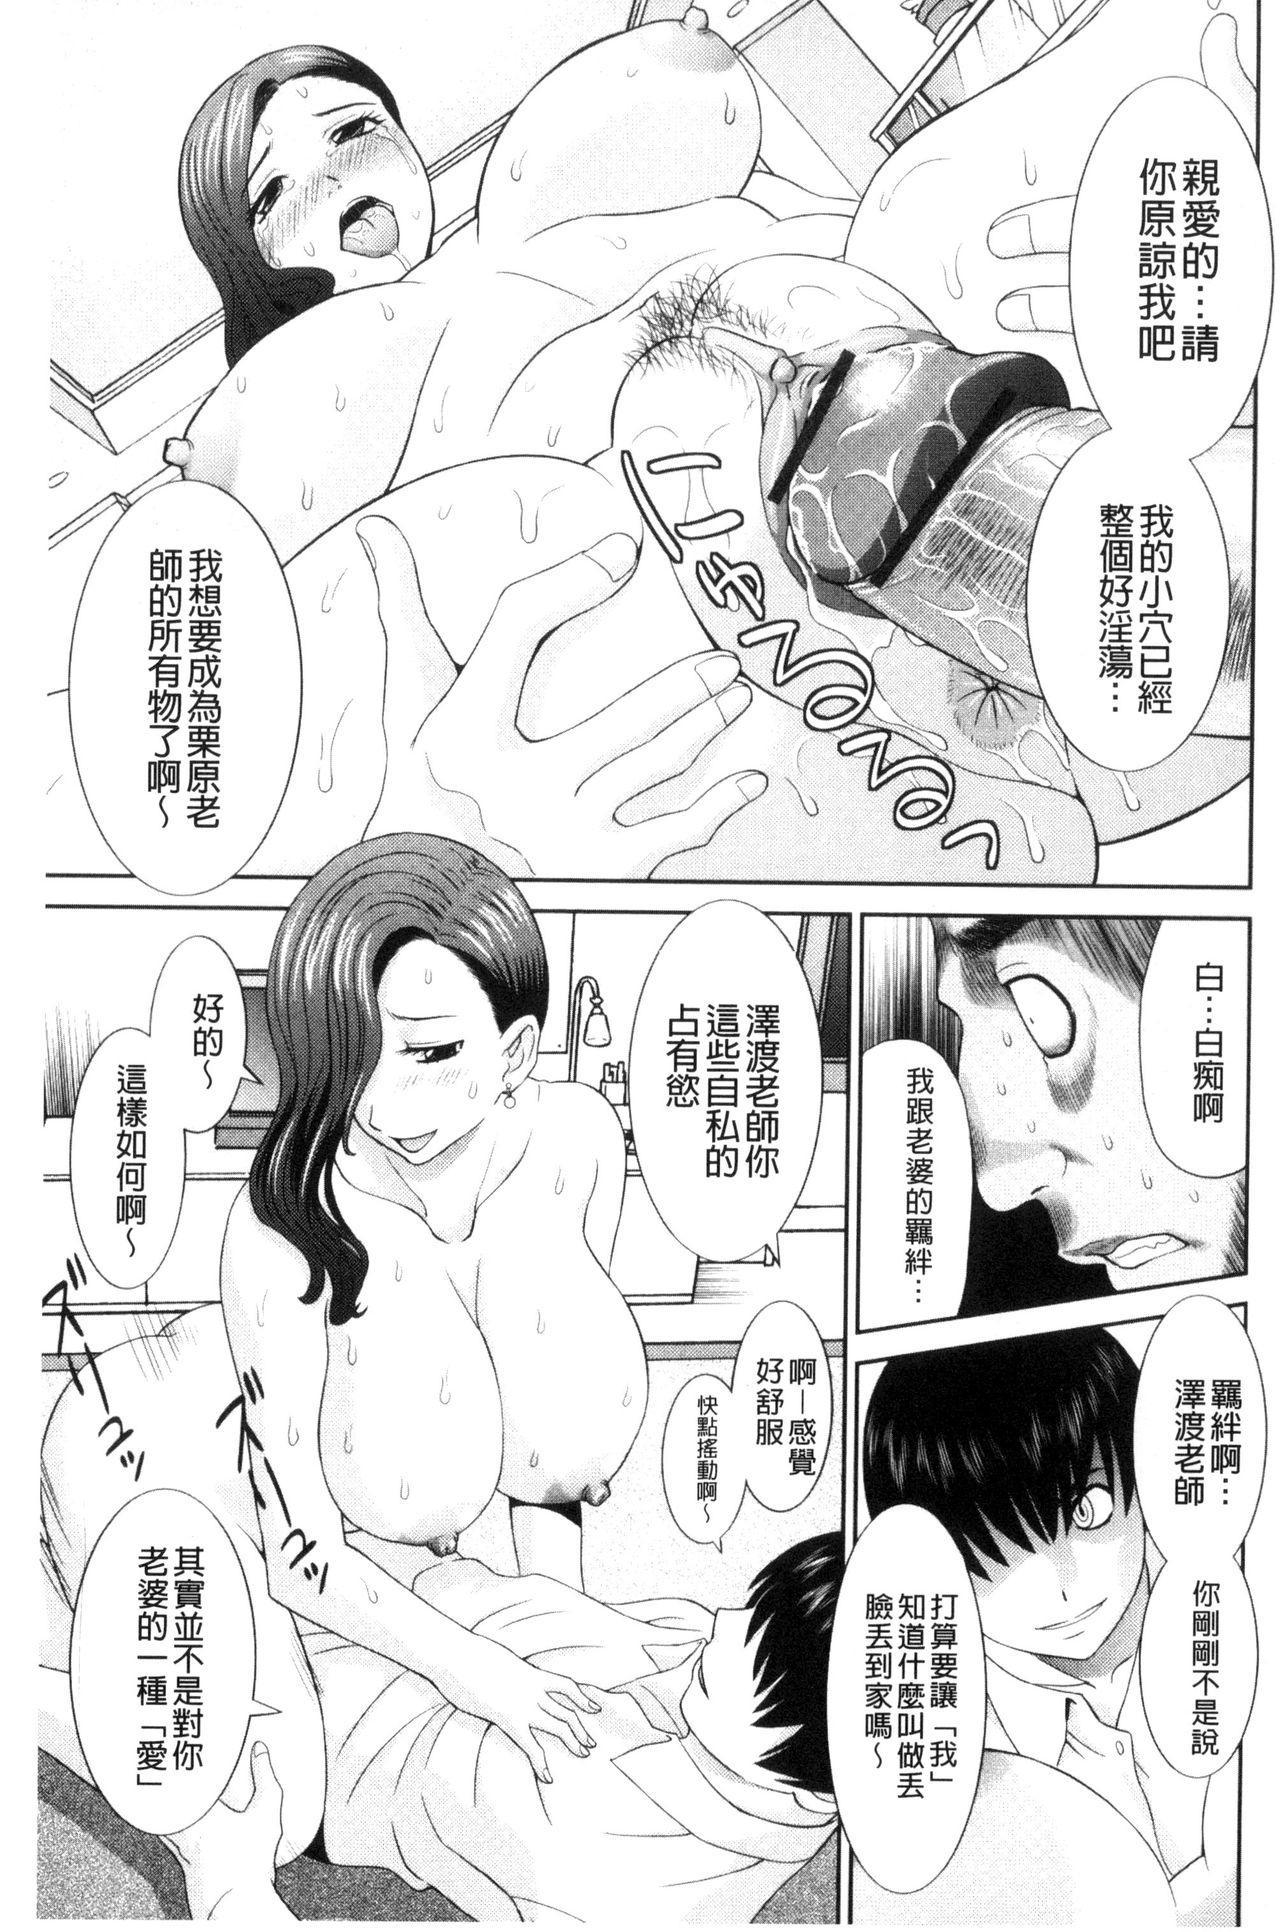 Haramase! Hitozuma Choukyoushi | 受孕吧!人妻調教師 132